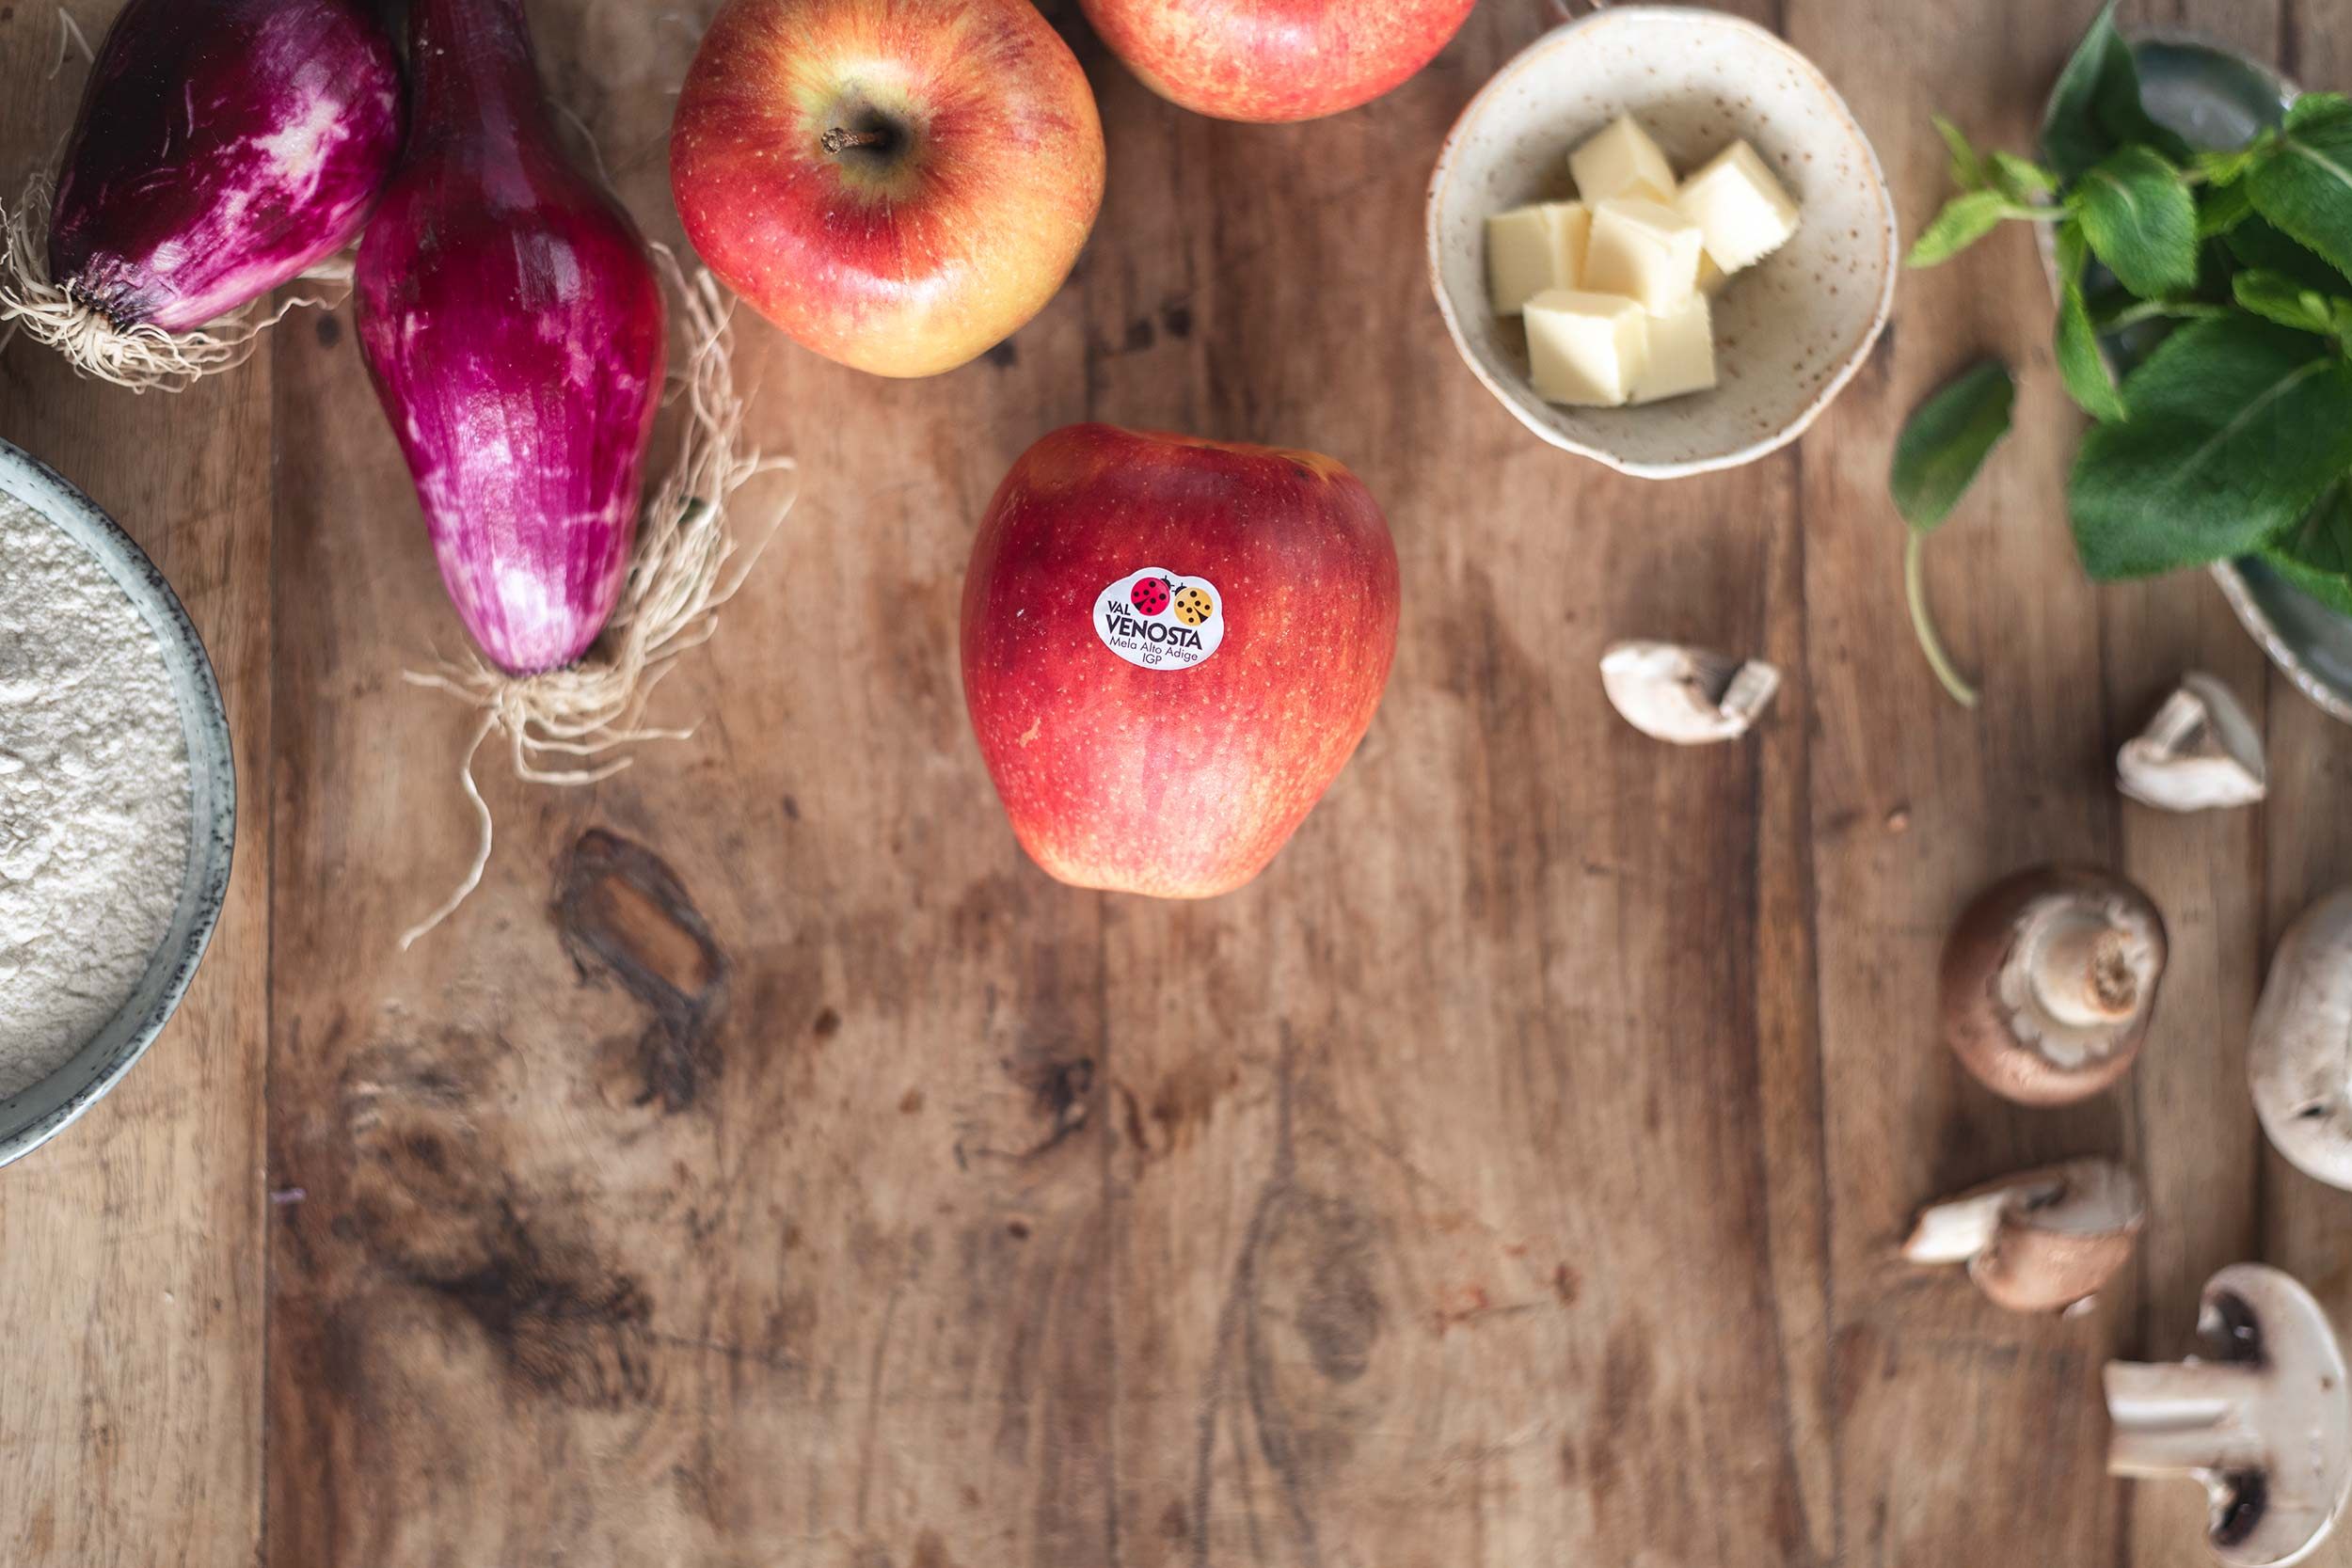 mushroom gallette with apples